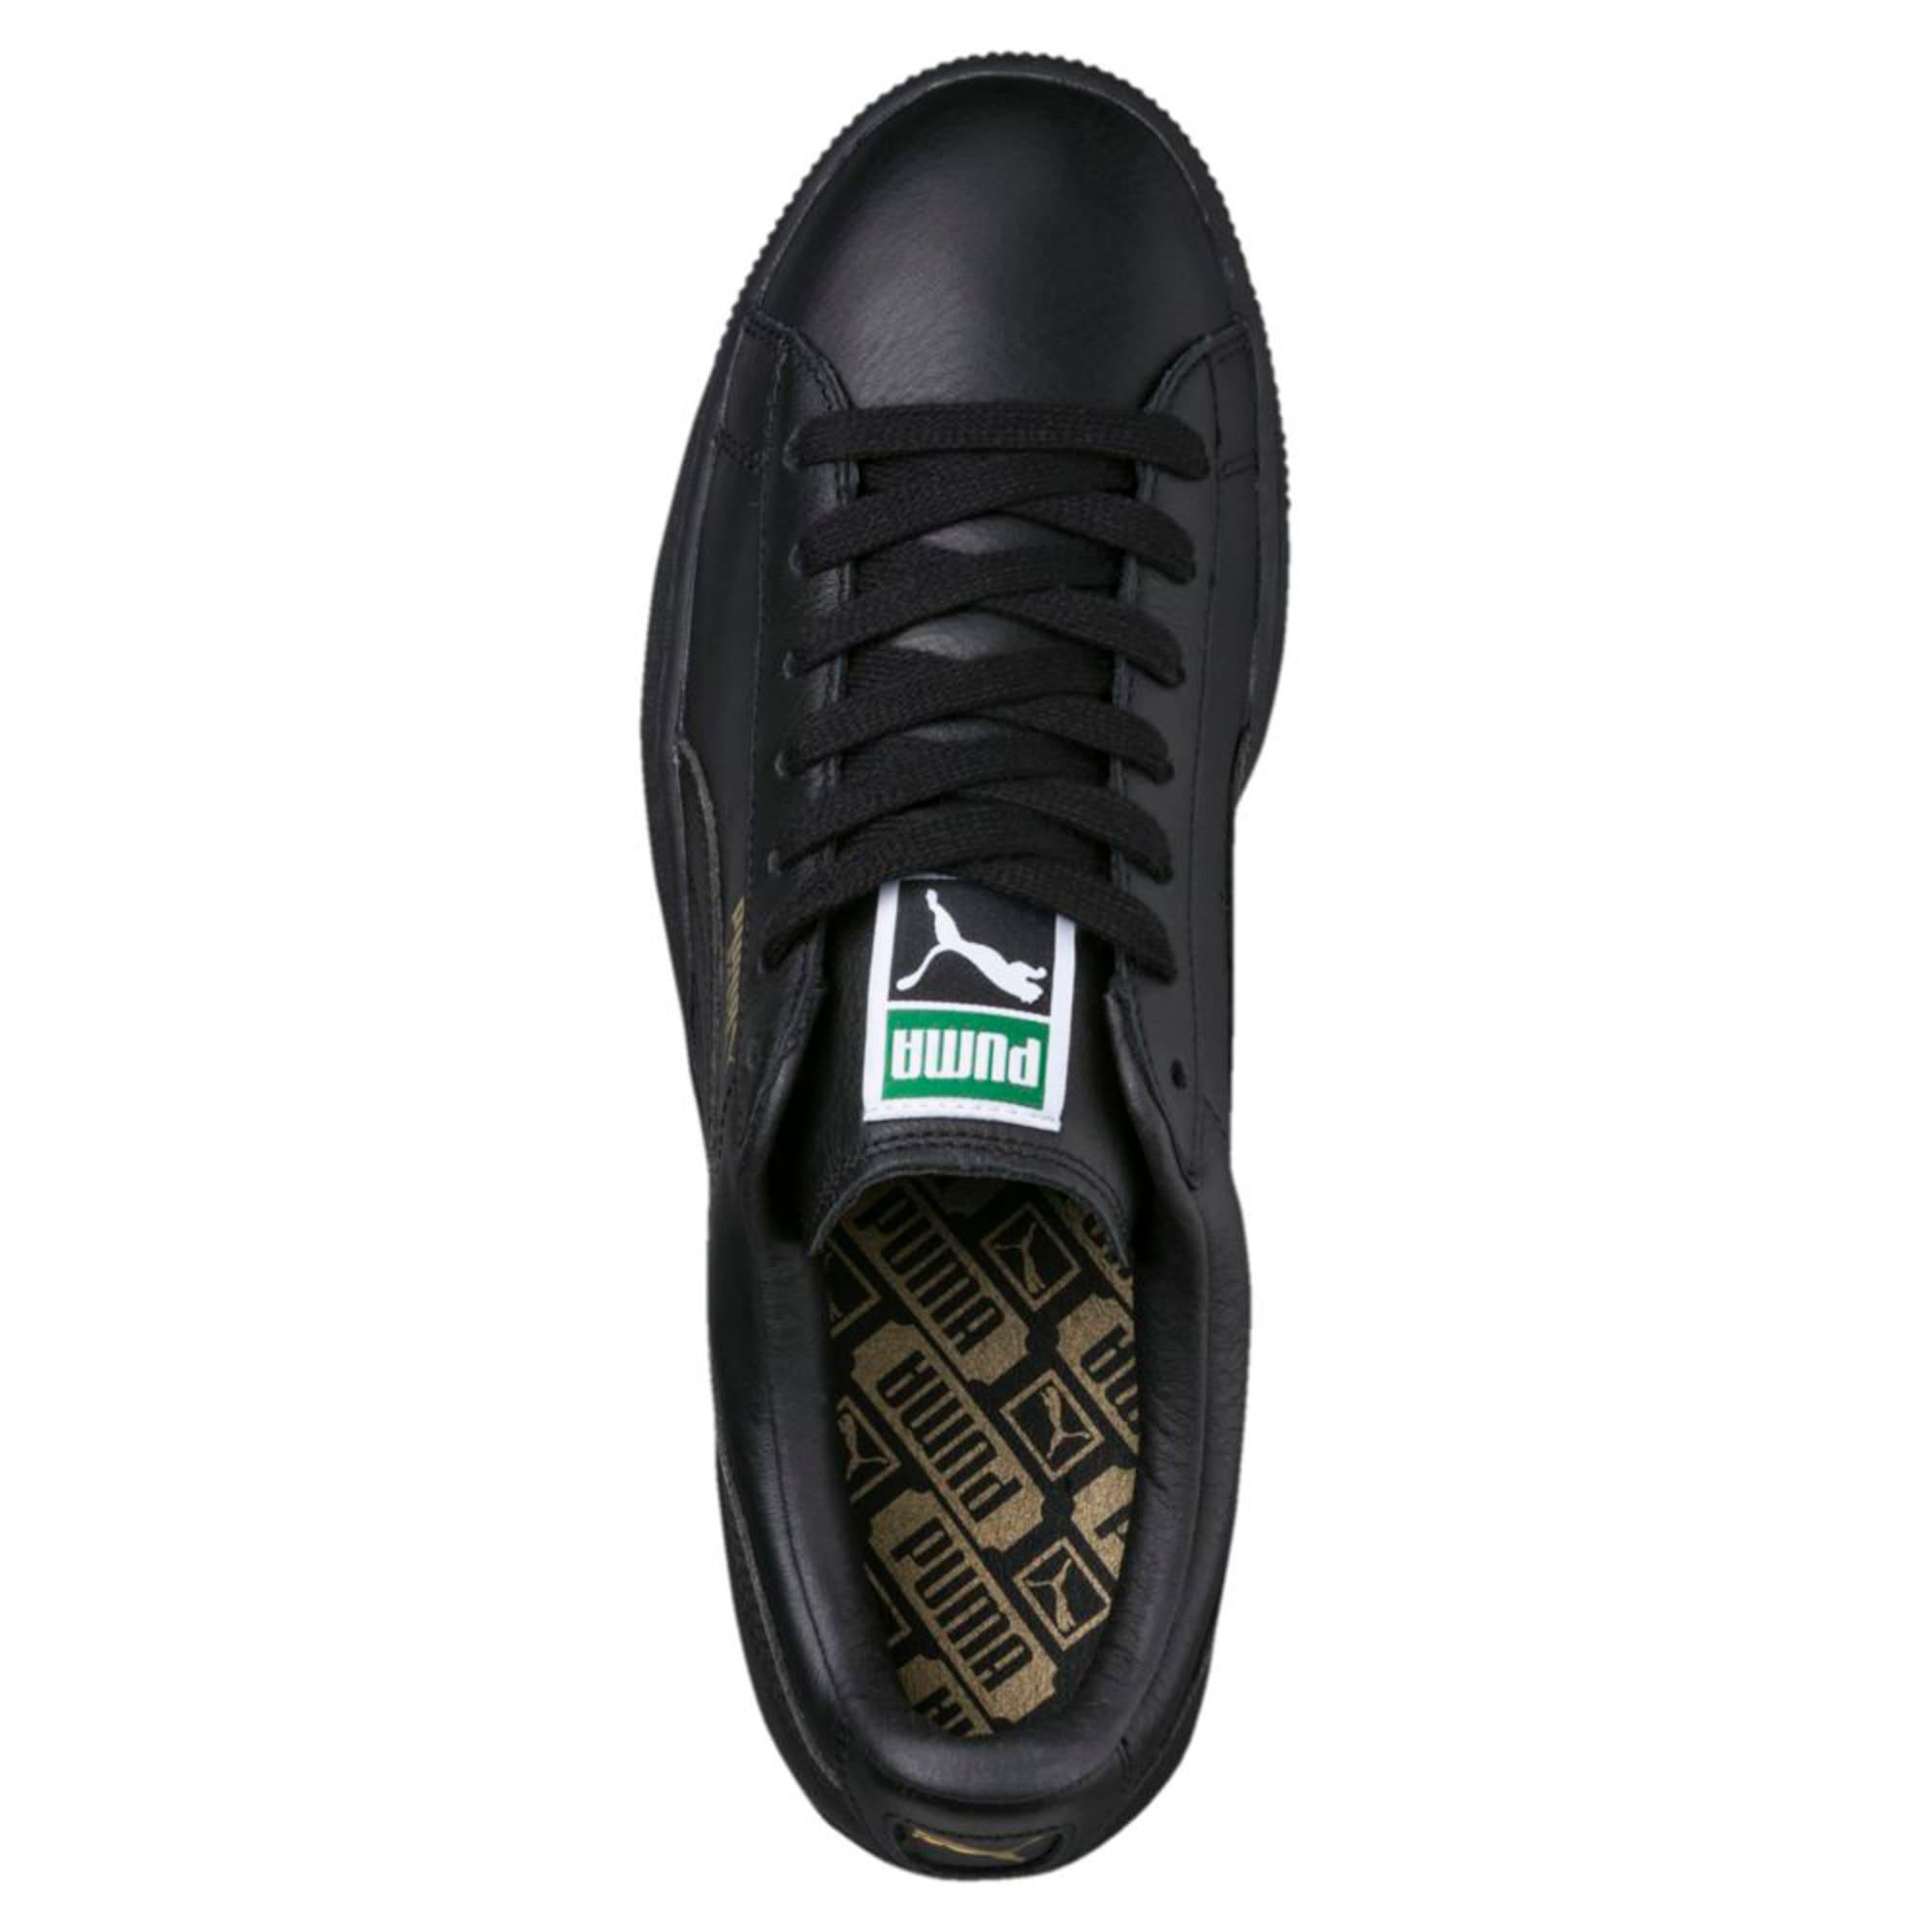 Thumbnail 5 of Basket Classic LFS Men's Shoes, black-team gold, medium-IND